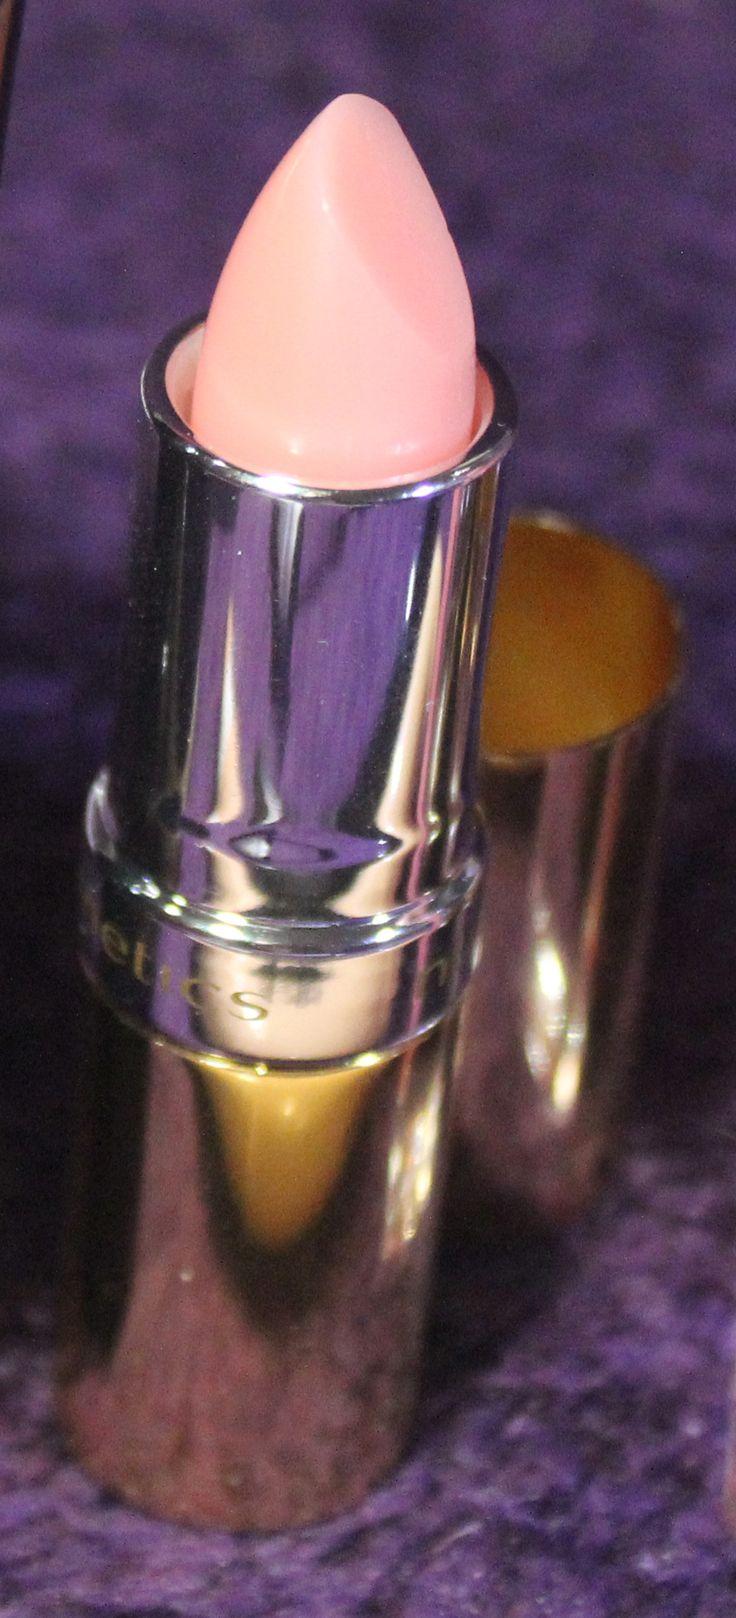 https://www.facebook.com/nutrimeticsjackietagg APRICOT KISSES Nutri-Rich Lip Treatment - $33rrp (2015) Non stinging, silky smooth, nourishing lip treatment for cracked and split lips. https://www.nutrimetics.com.au/jackietagg